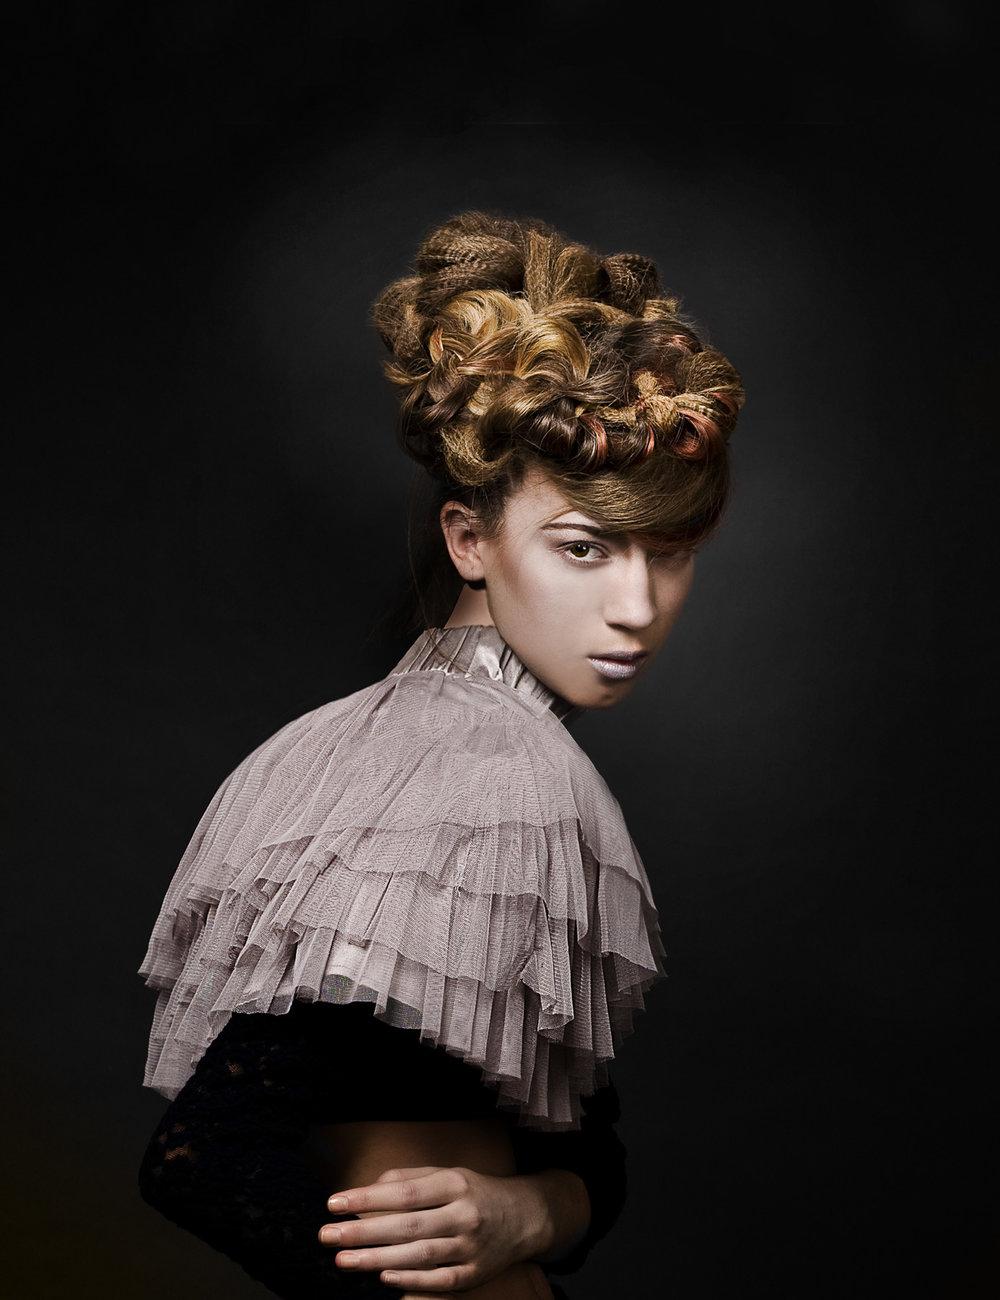 M_Alarie_Salon_Pure_HairstylistOfTheYear_01.jpg